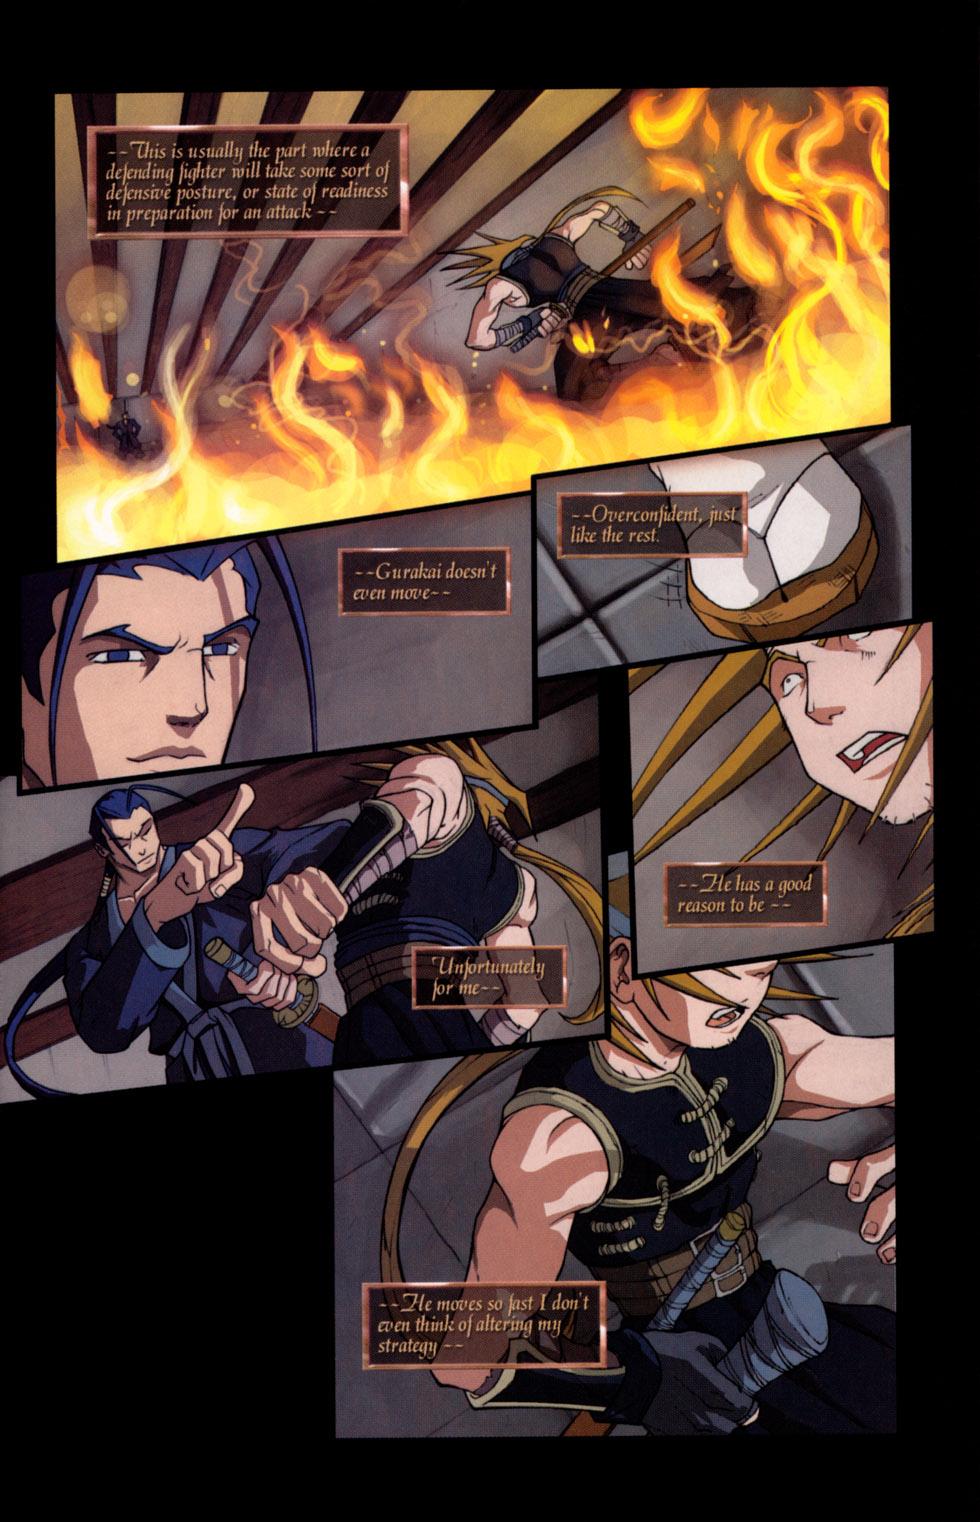 Read online Shidima comic -  Issue #7 - 3